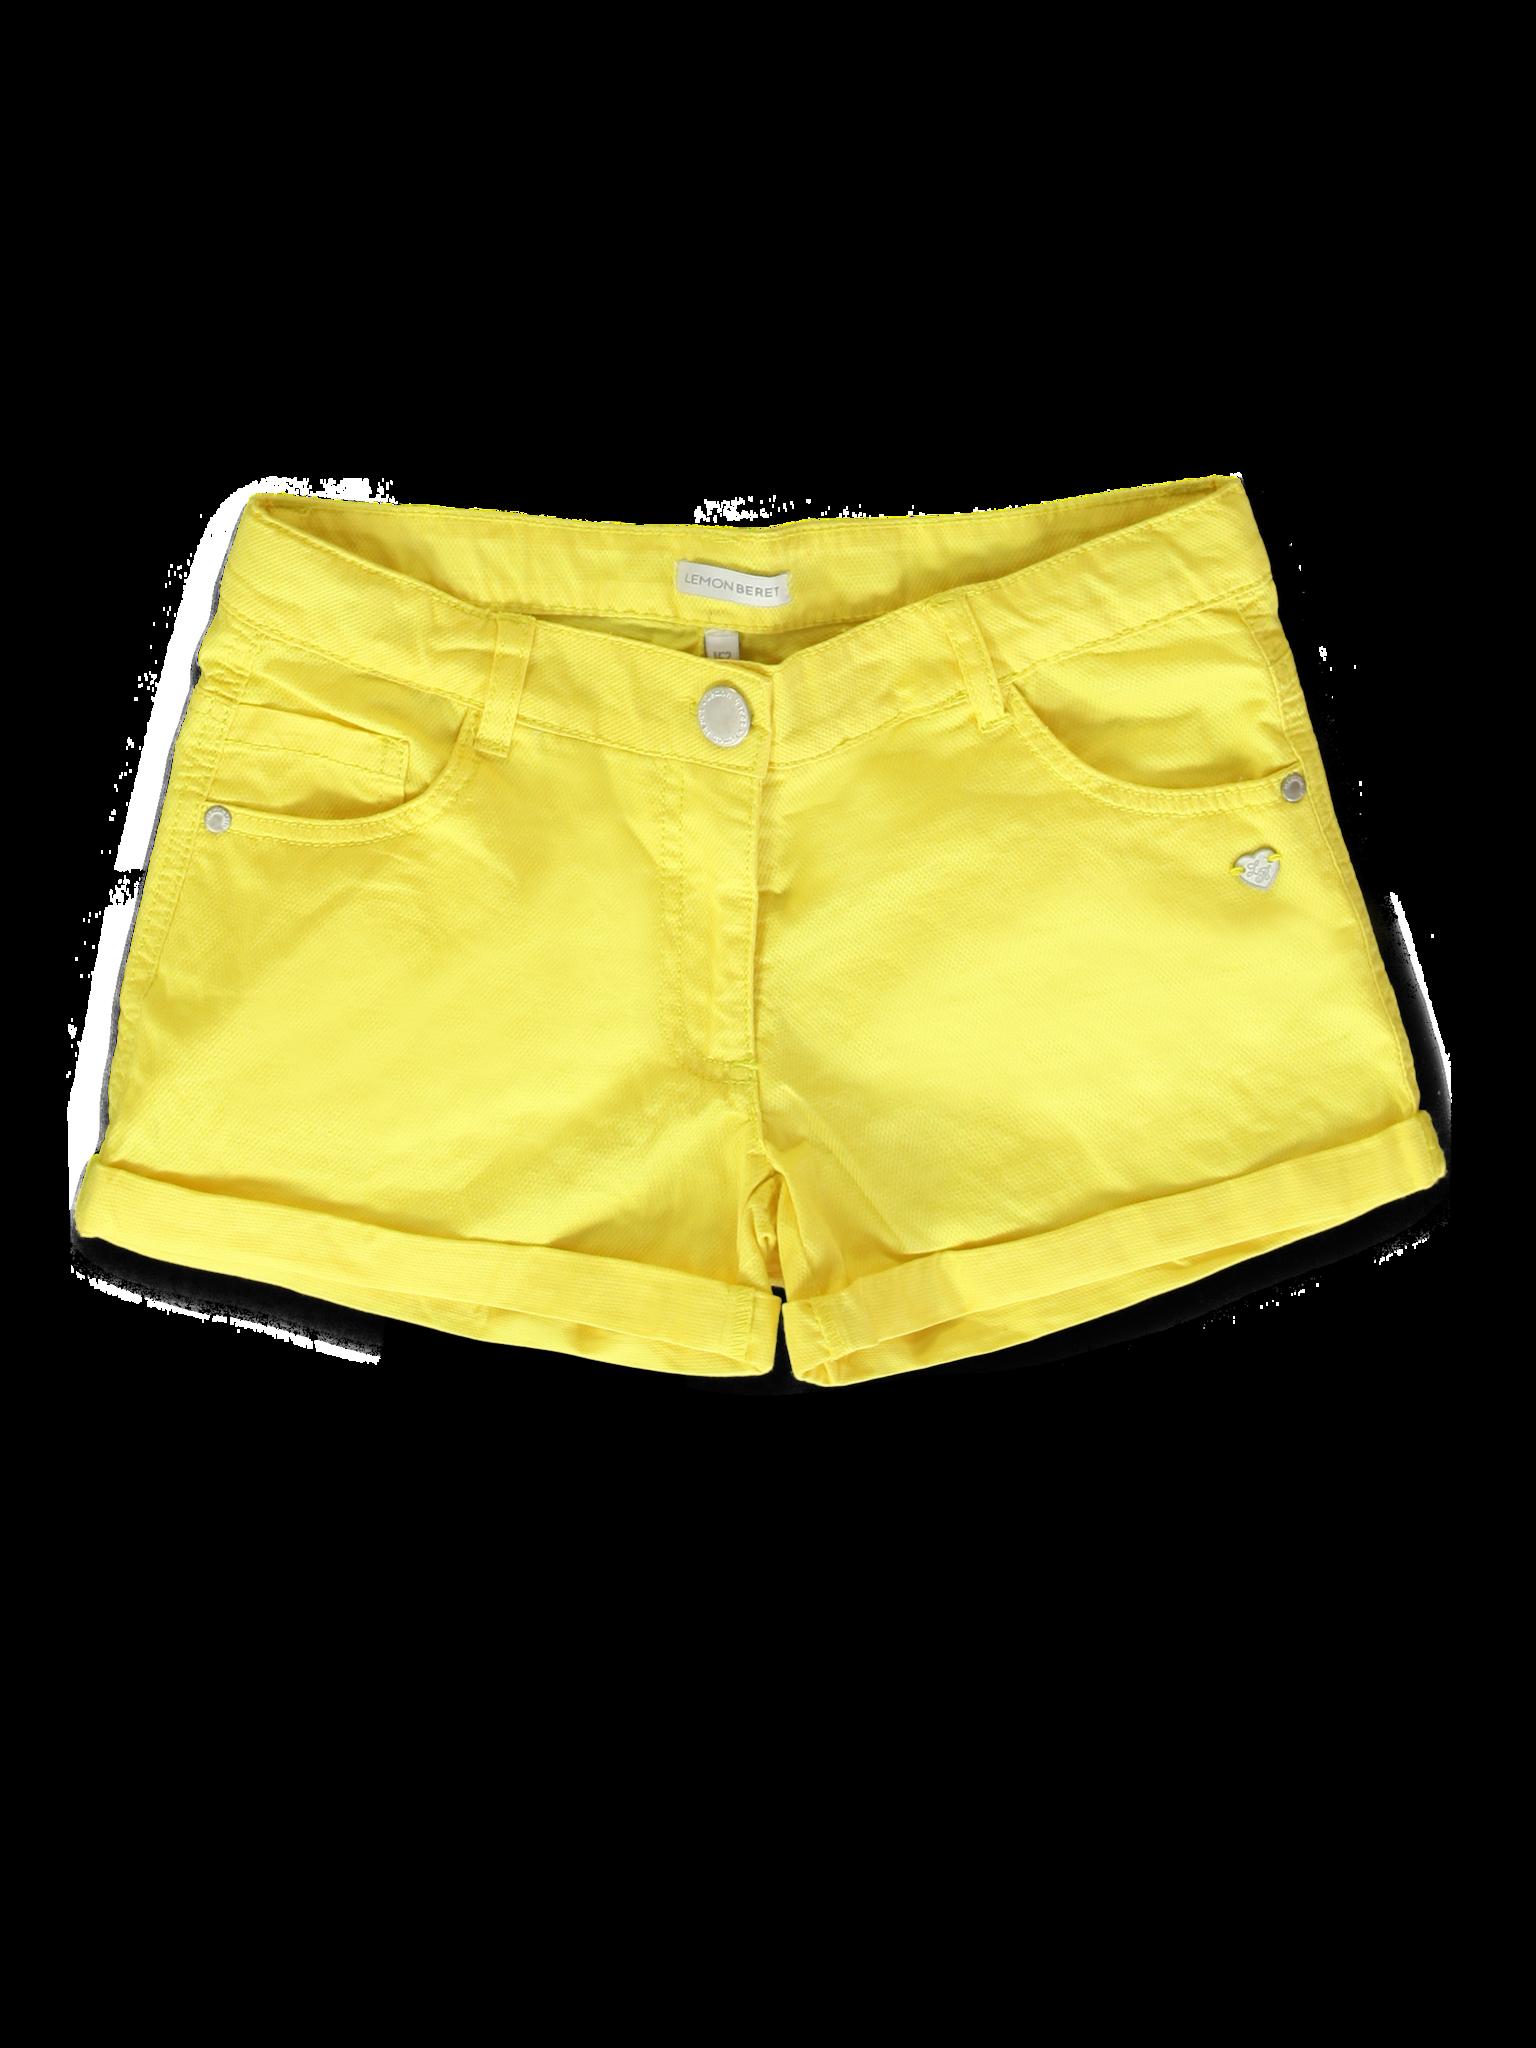 All Brands   Summerproducts Teen Girls   Shorts   10 pcs/box